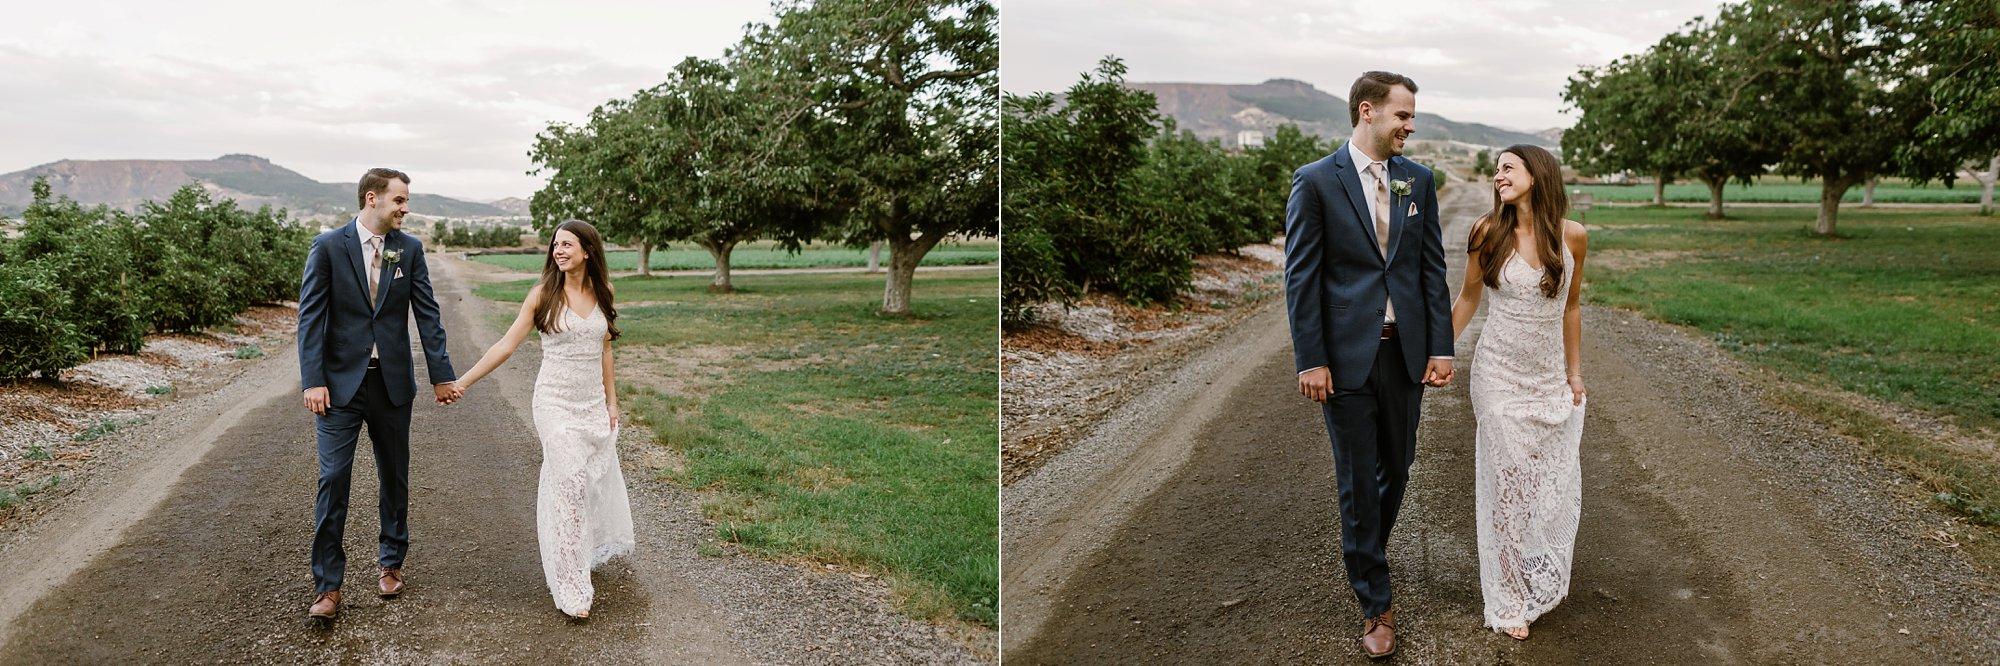 Walnut Grove Moorpark California Wedding_0060.jpg